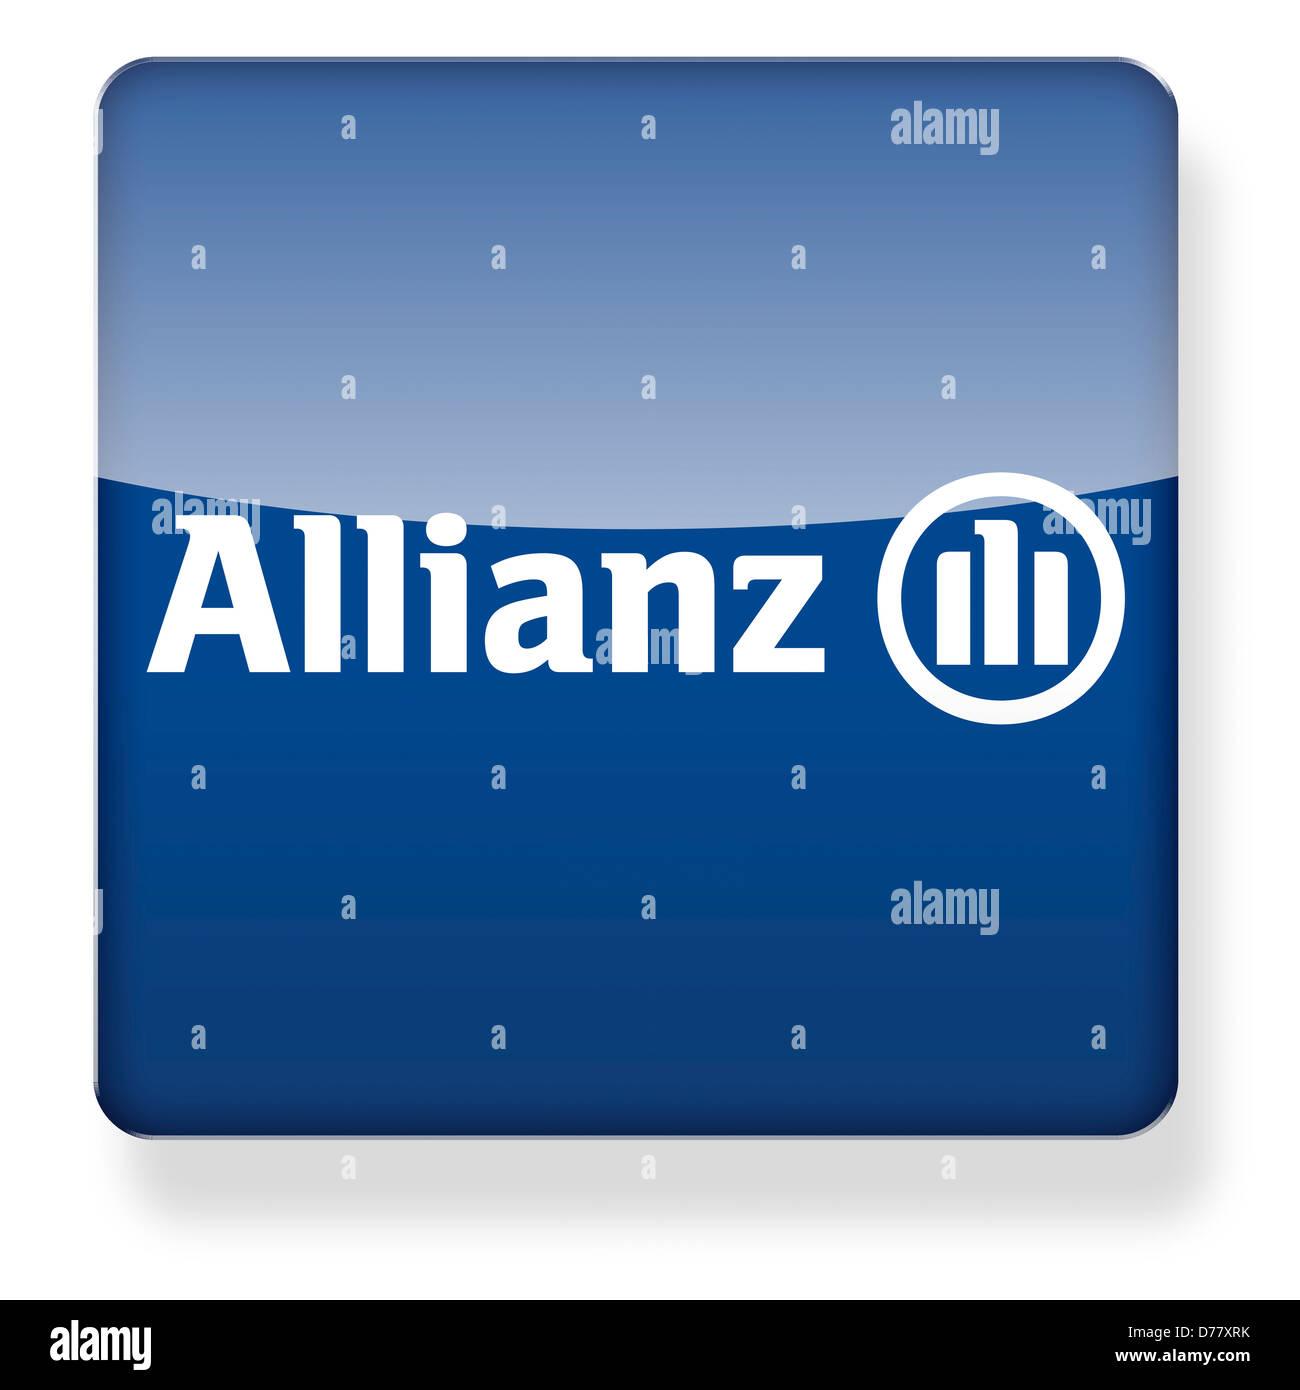 Allianz insurance logo as an app icon. Clipping path ...